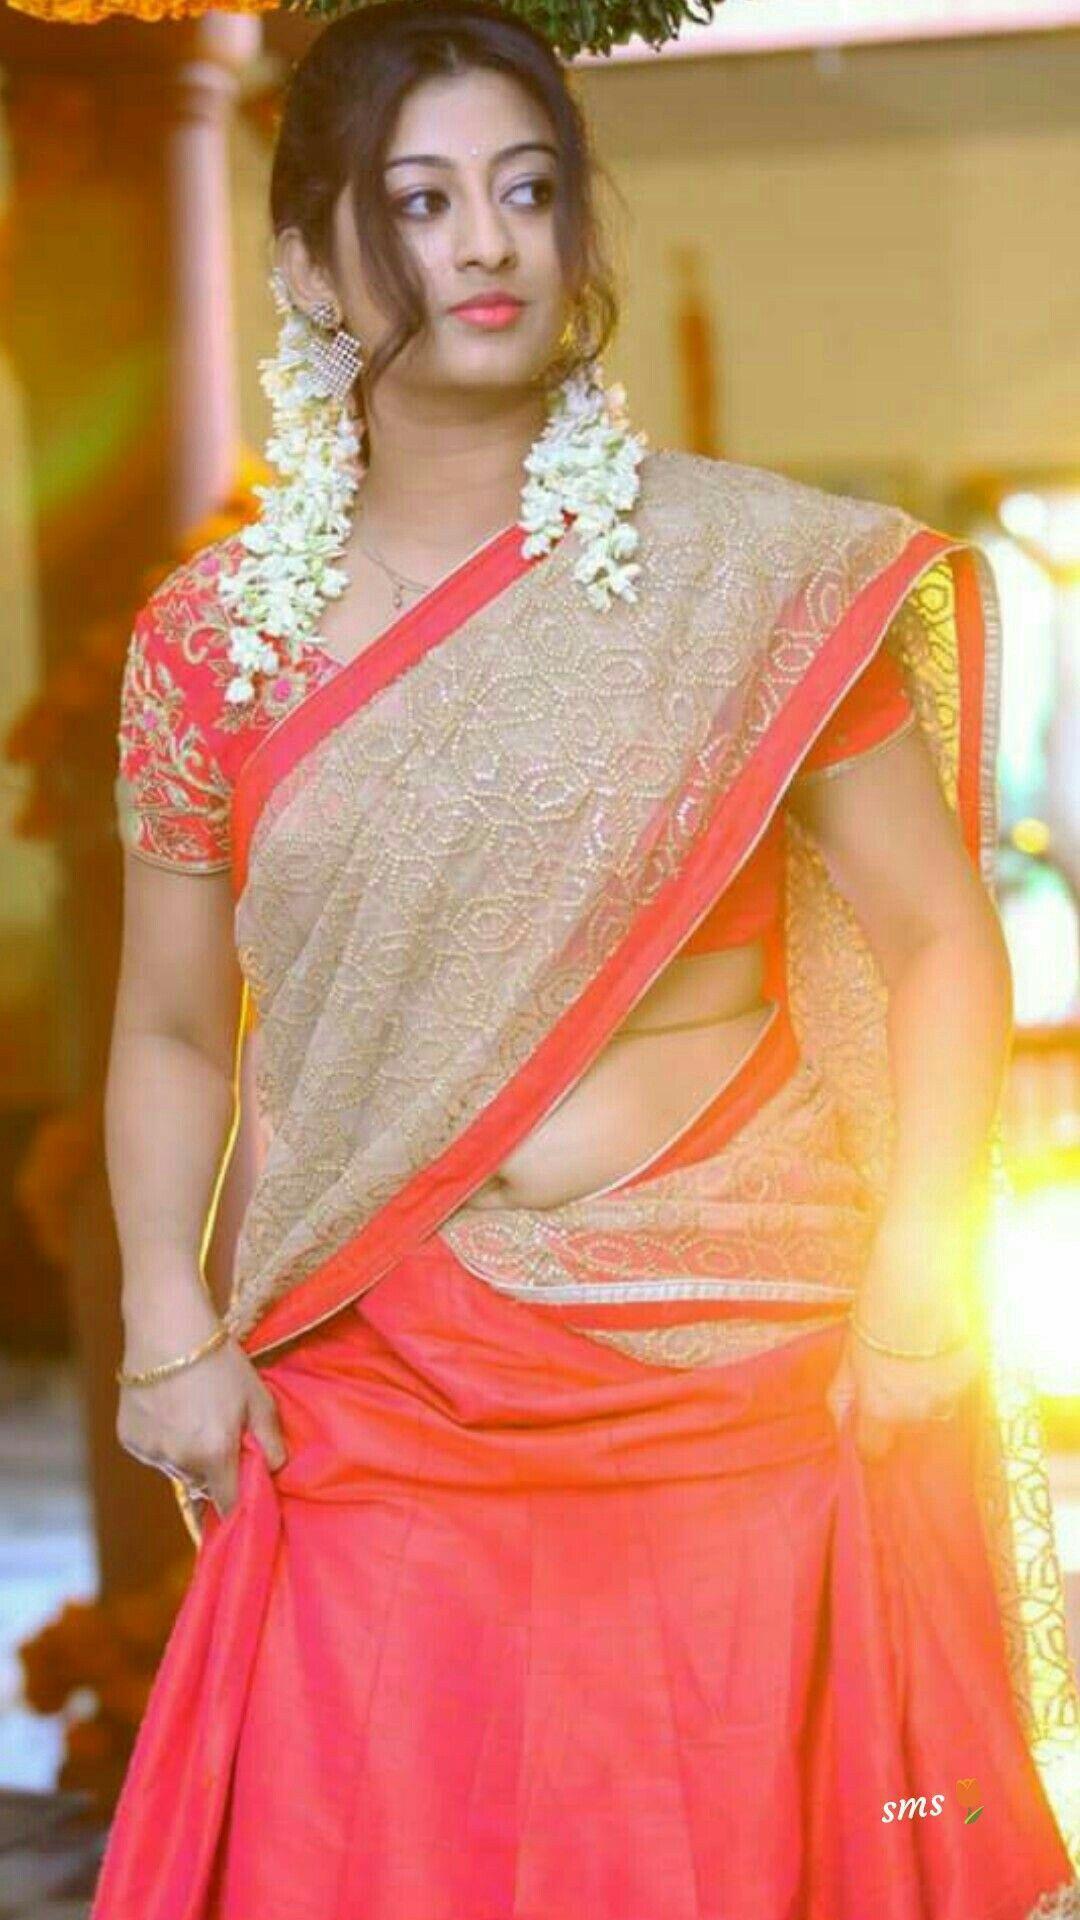 Pin by Srinivasan J on Beauty | Pinterest | Indian beauty, Desi and ...